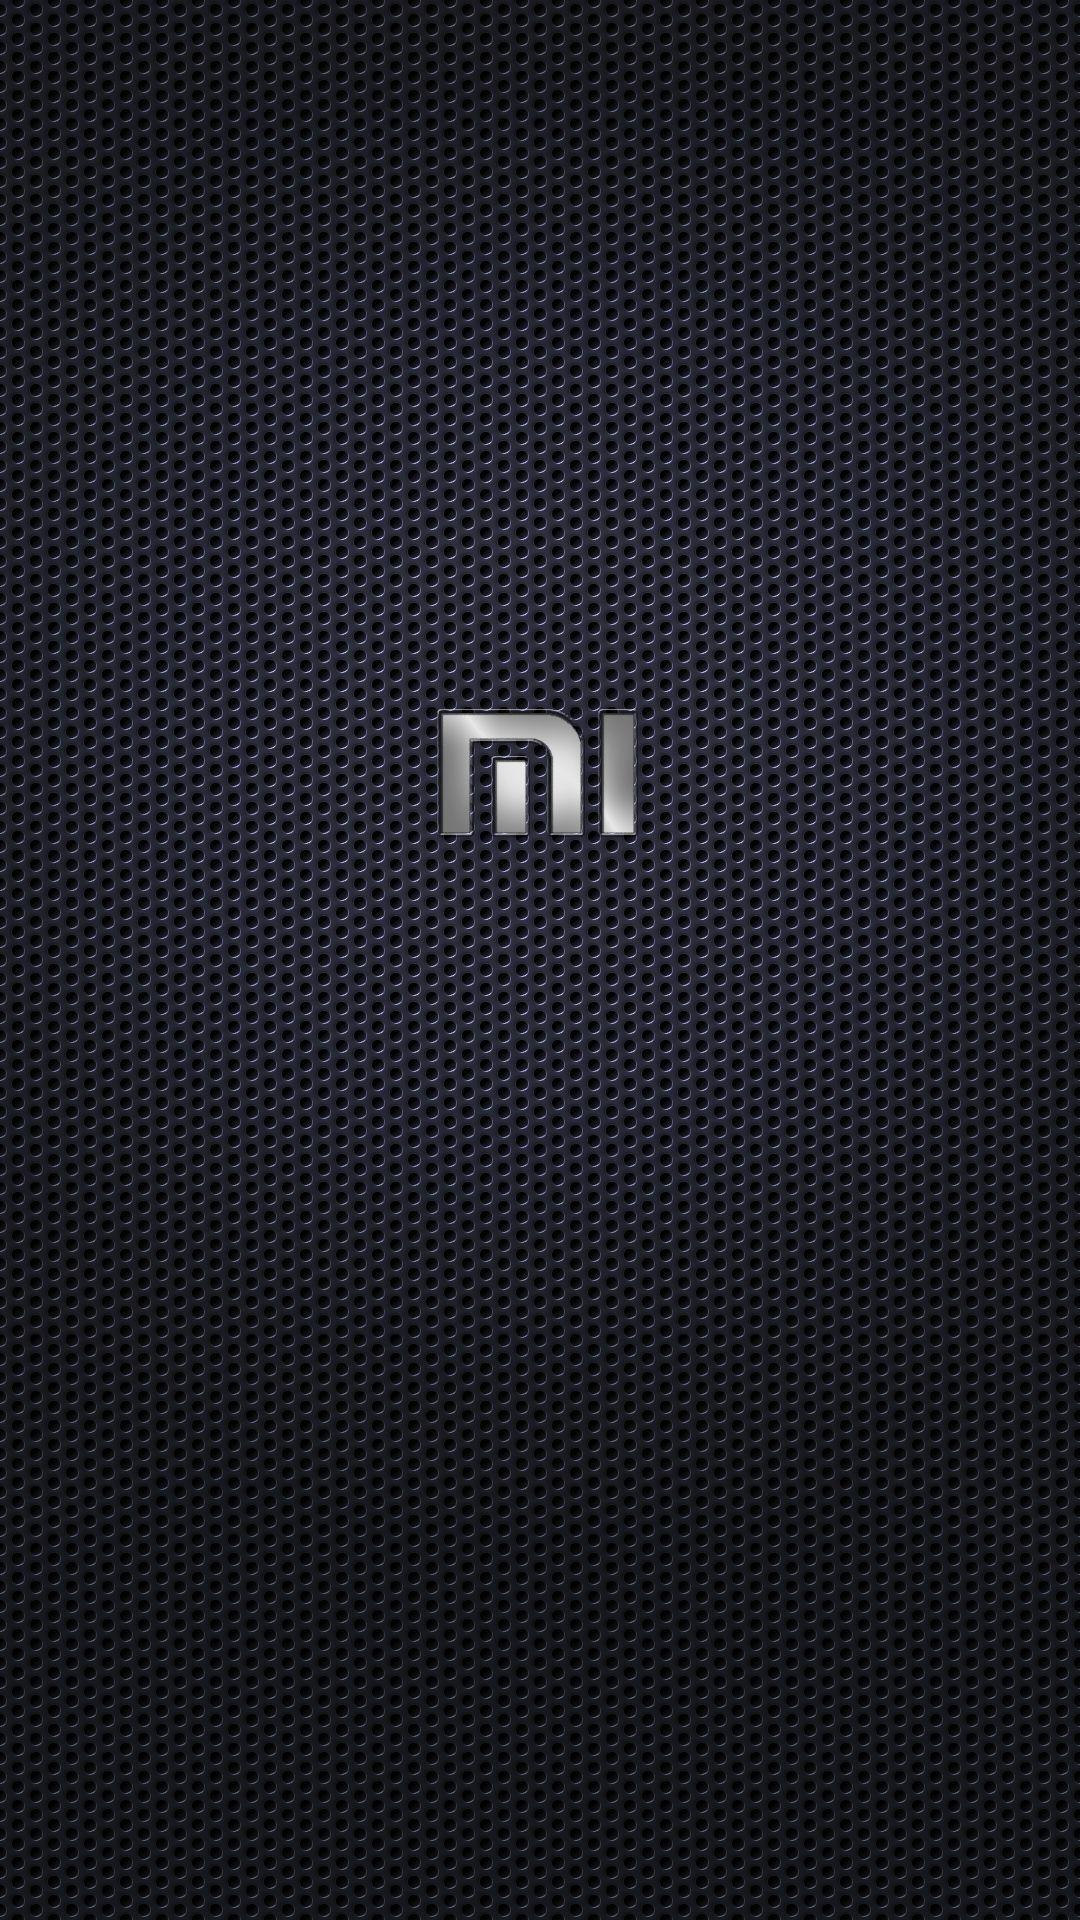 Xiaomi 4k Mobile Wallpapers Wallpaper Cave